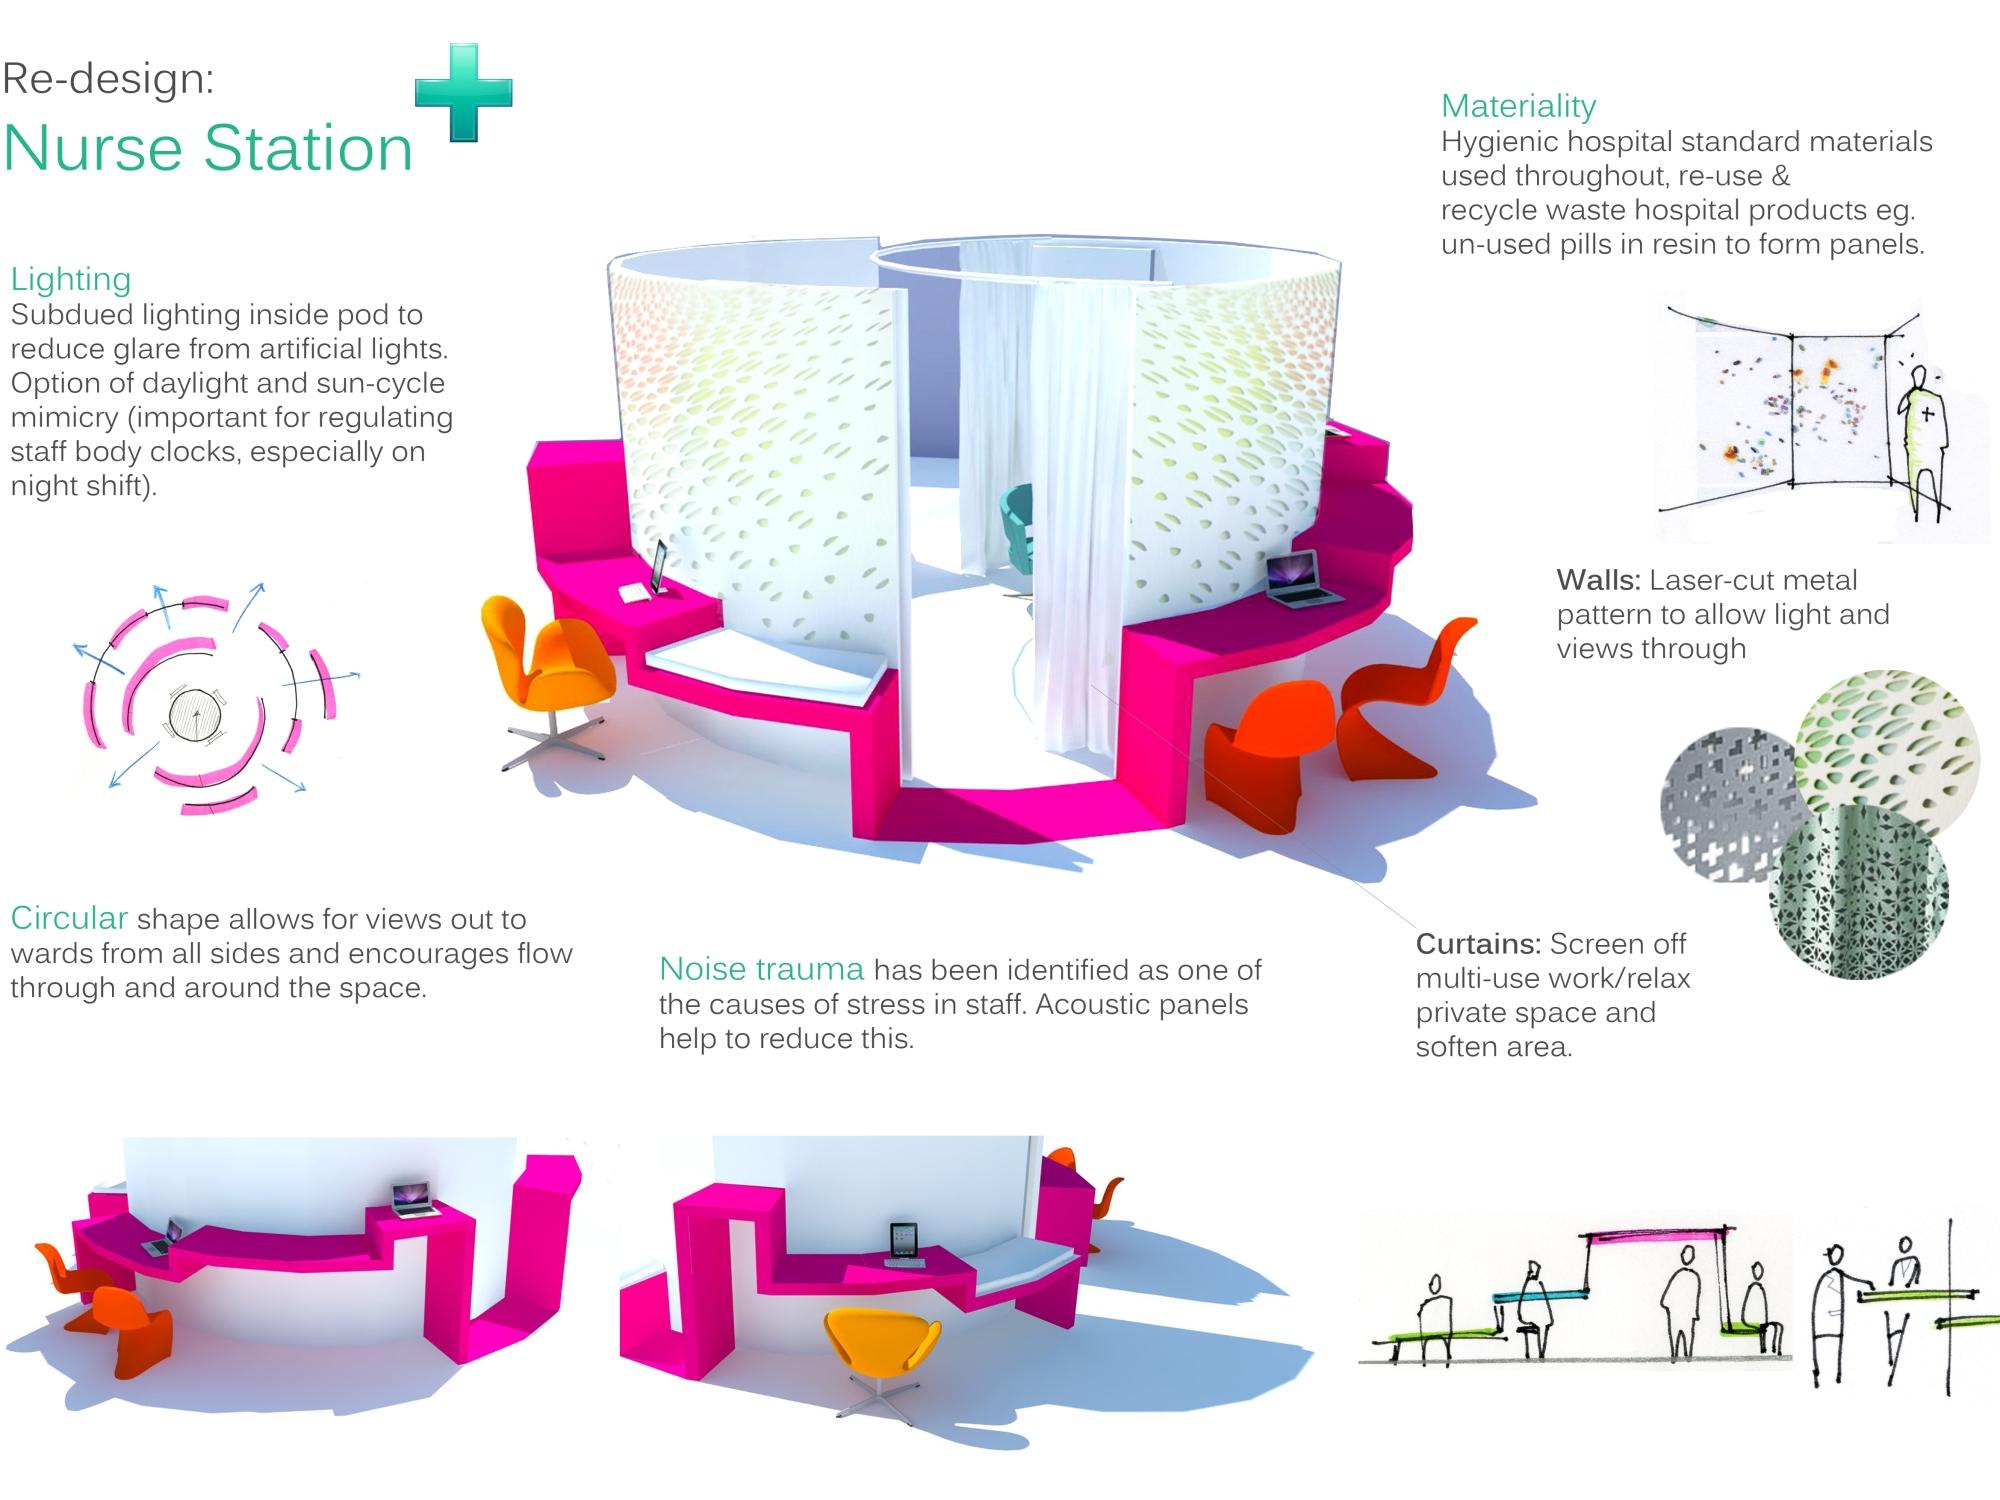 BAHons Interior Design At The University Of Huddersfield